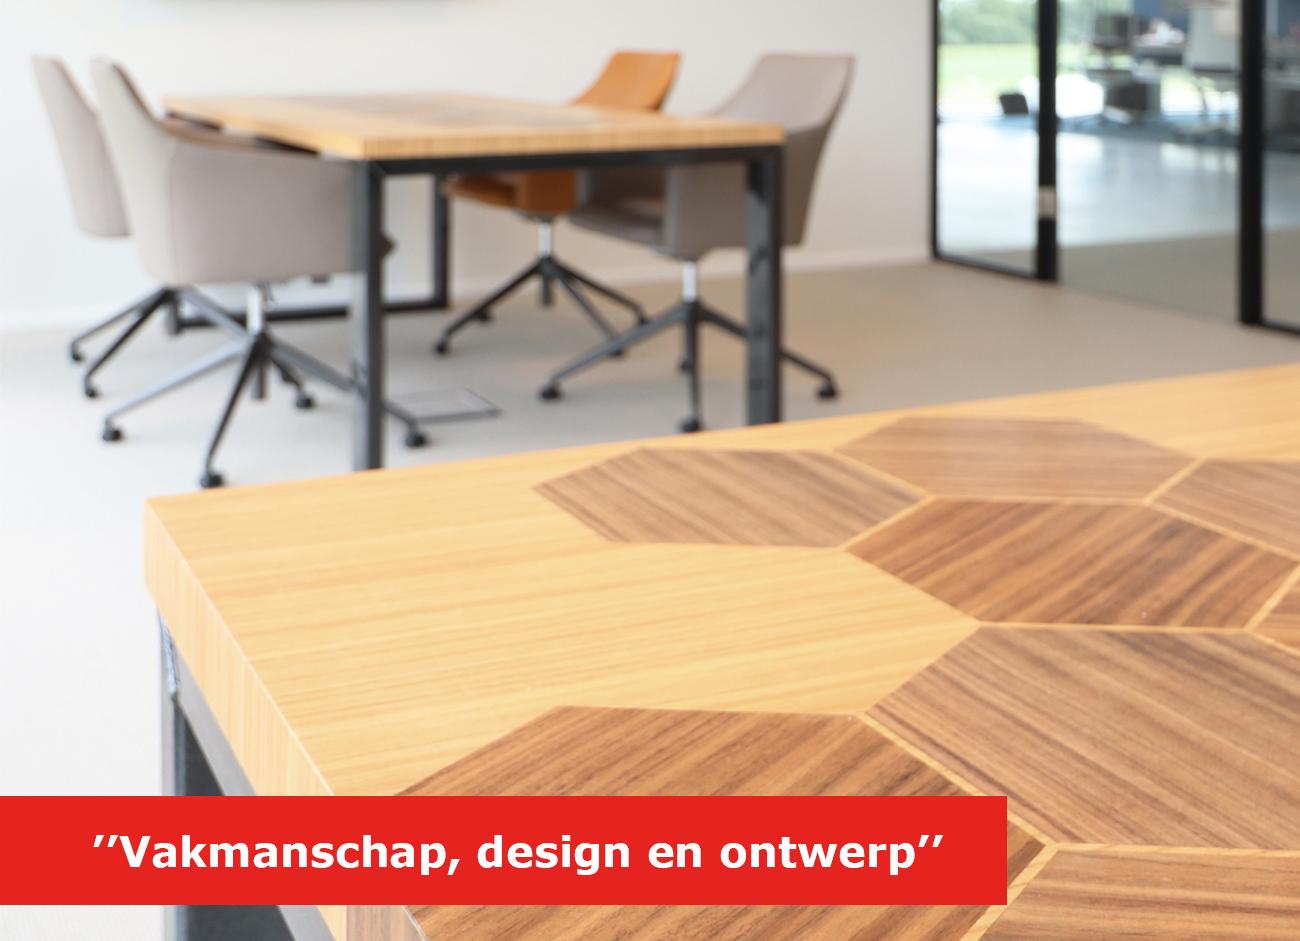 Gefineerde tafel met ontwerp